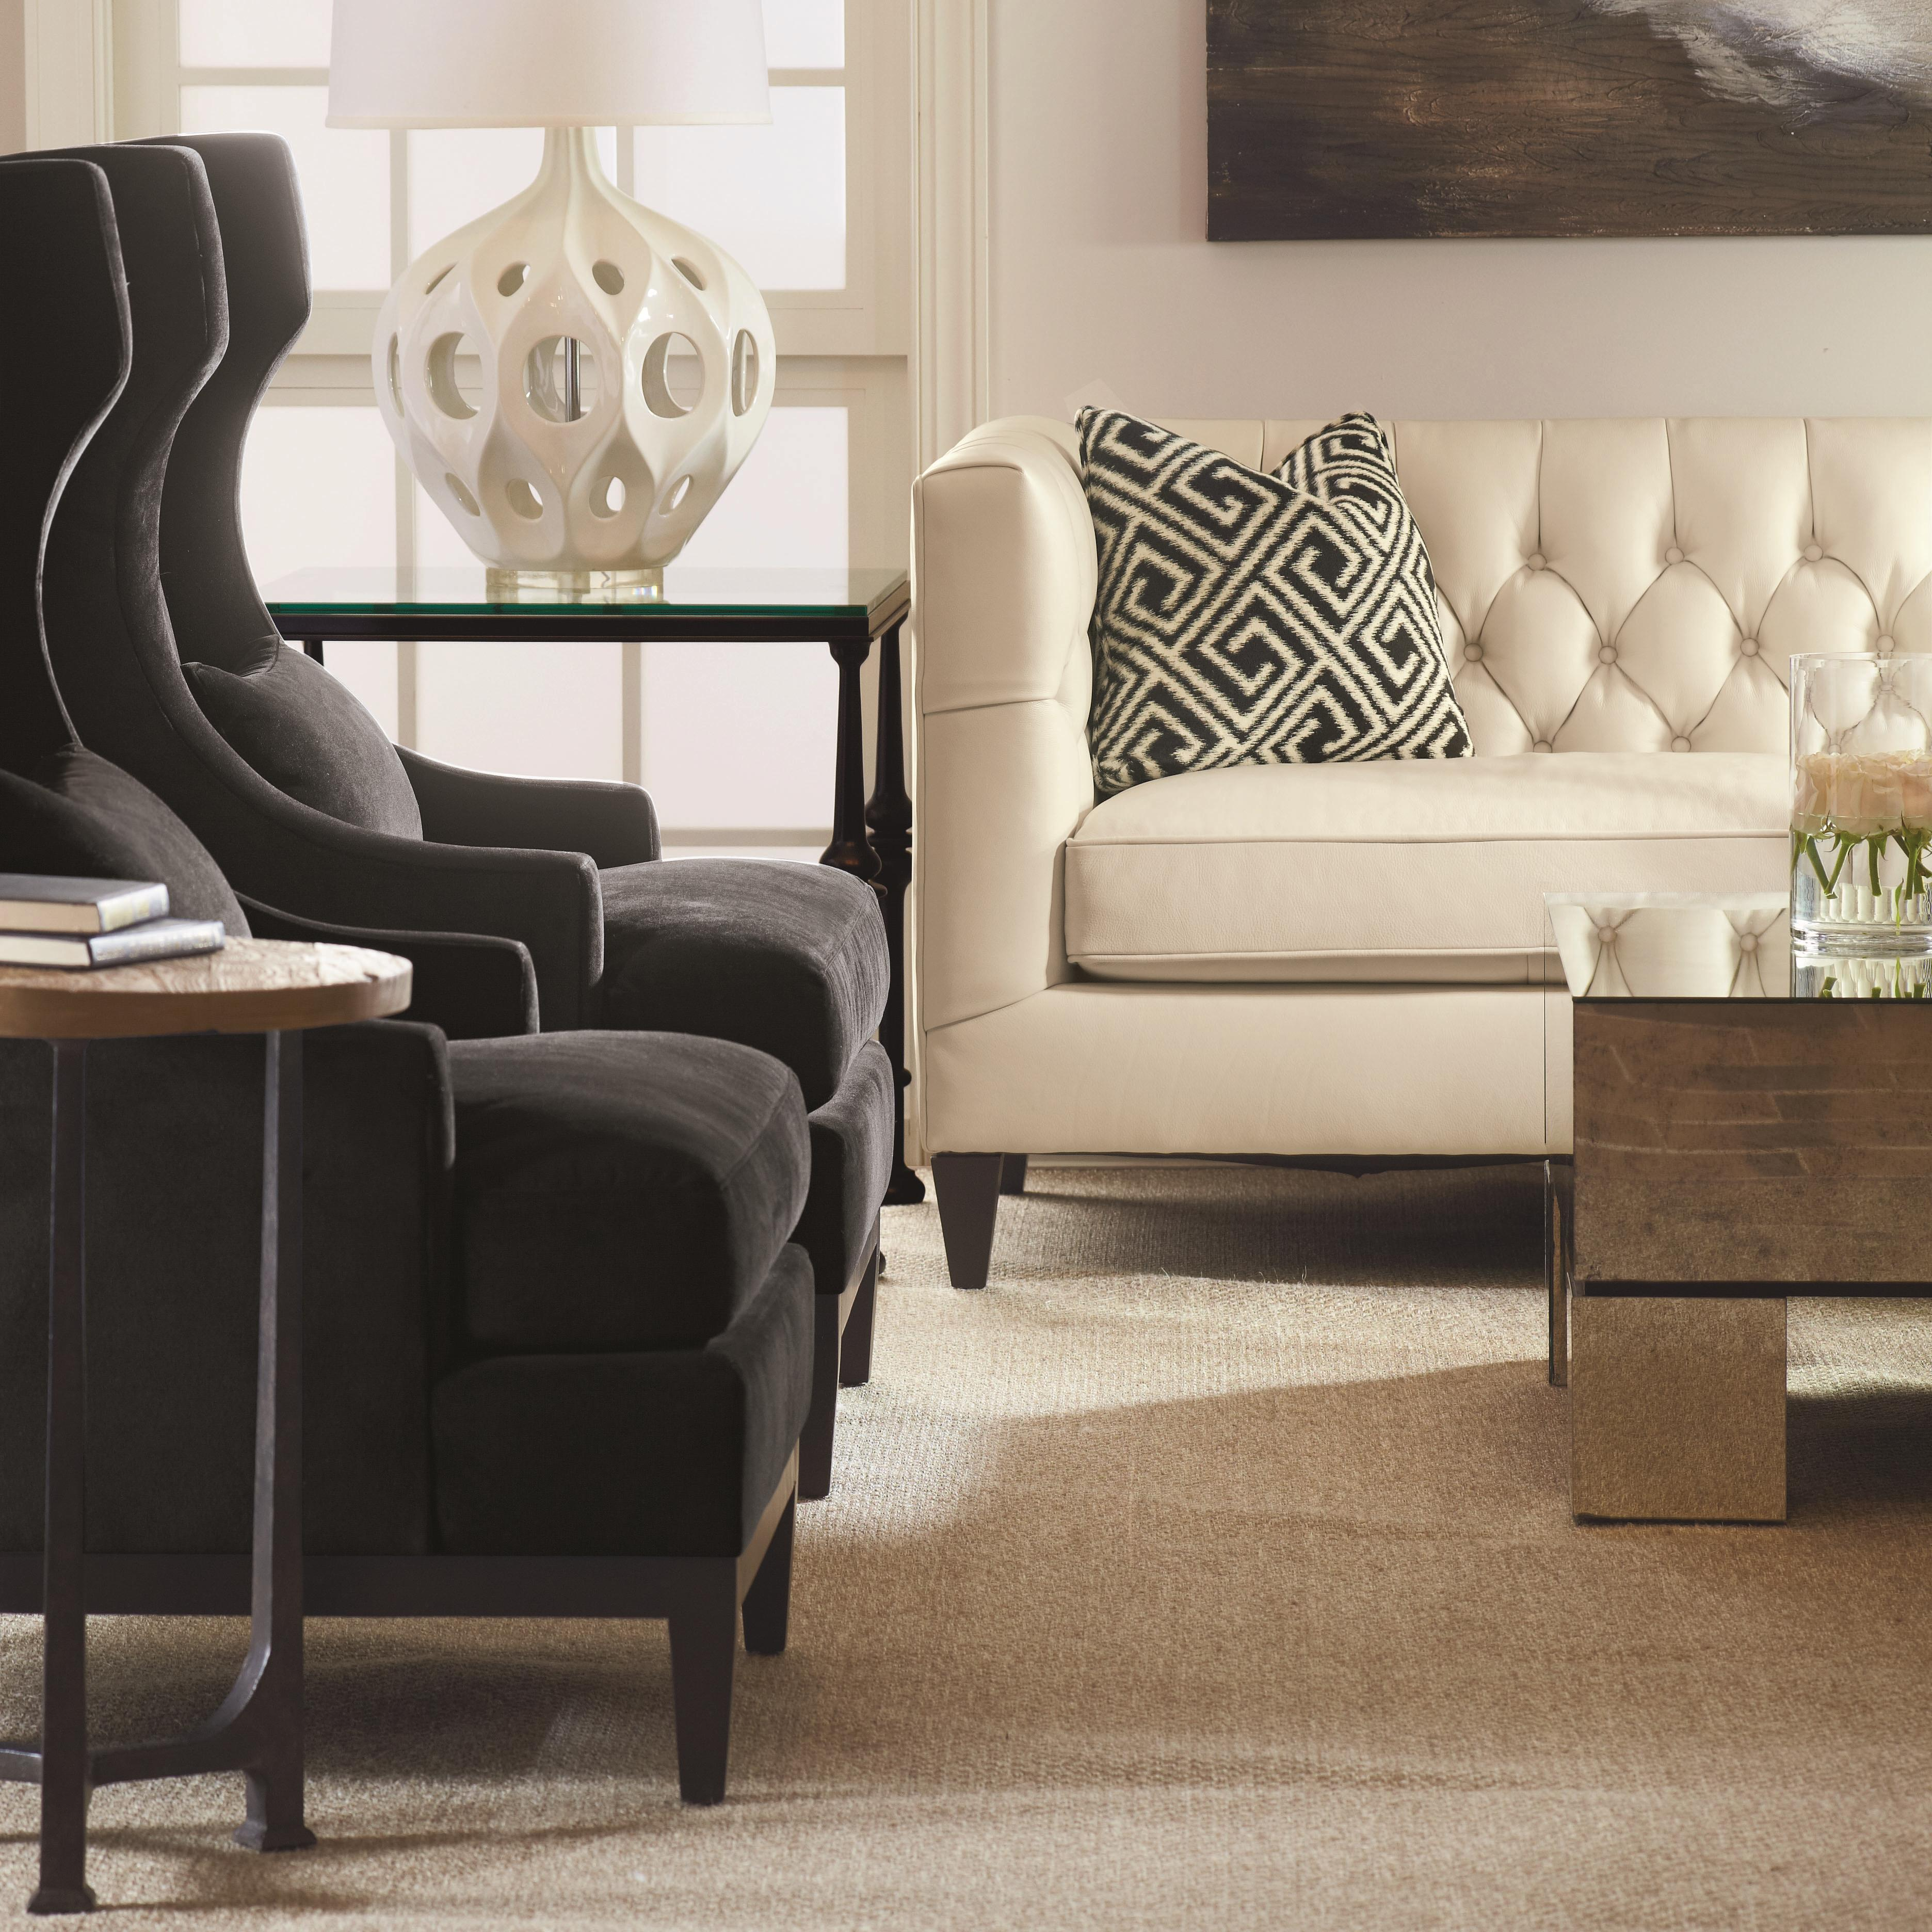 Bernhardt Interiors Sofas N8817l Transitional Styled